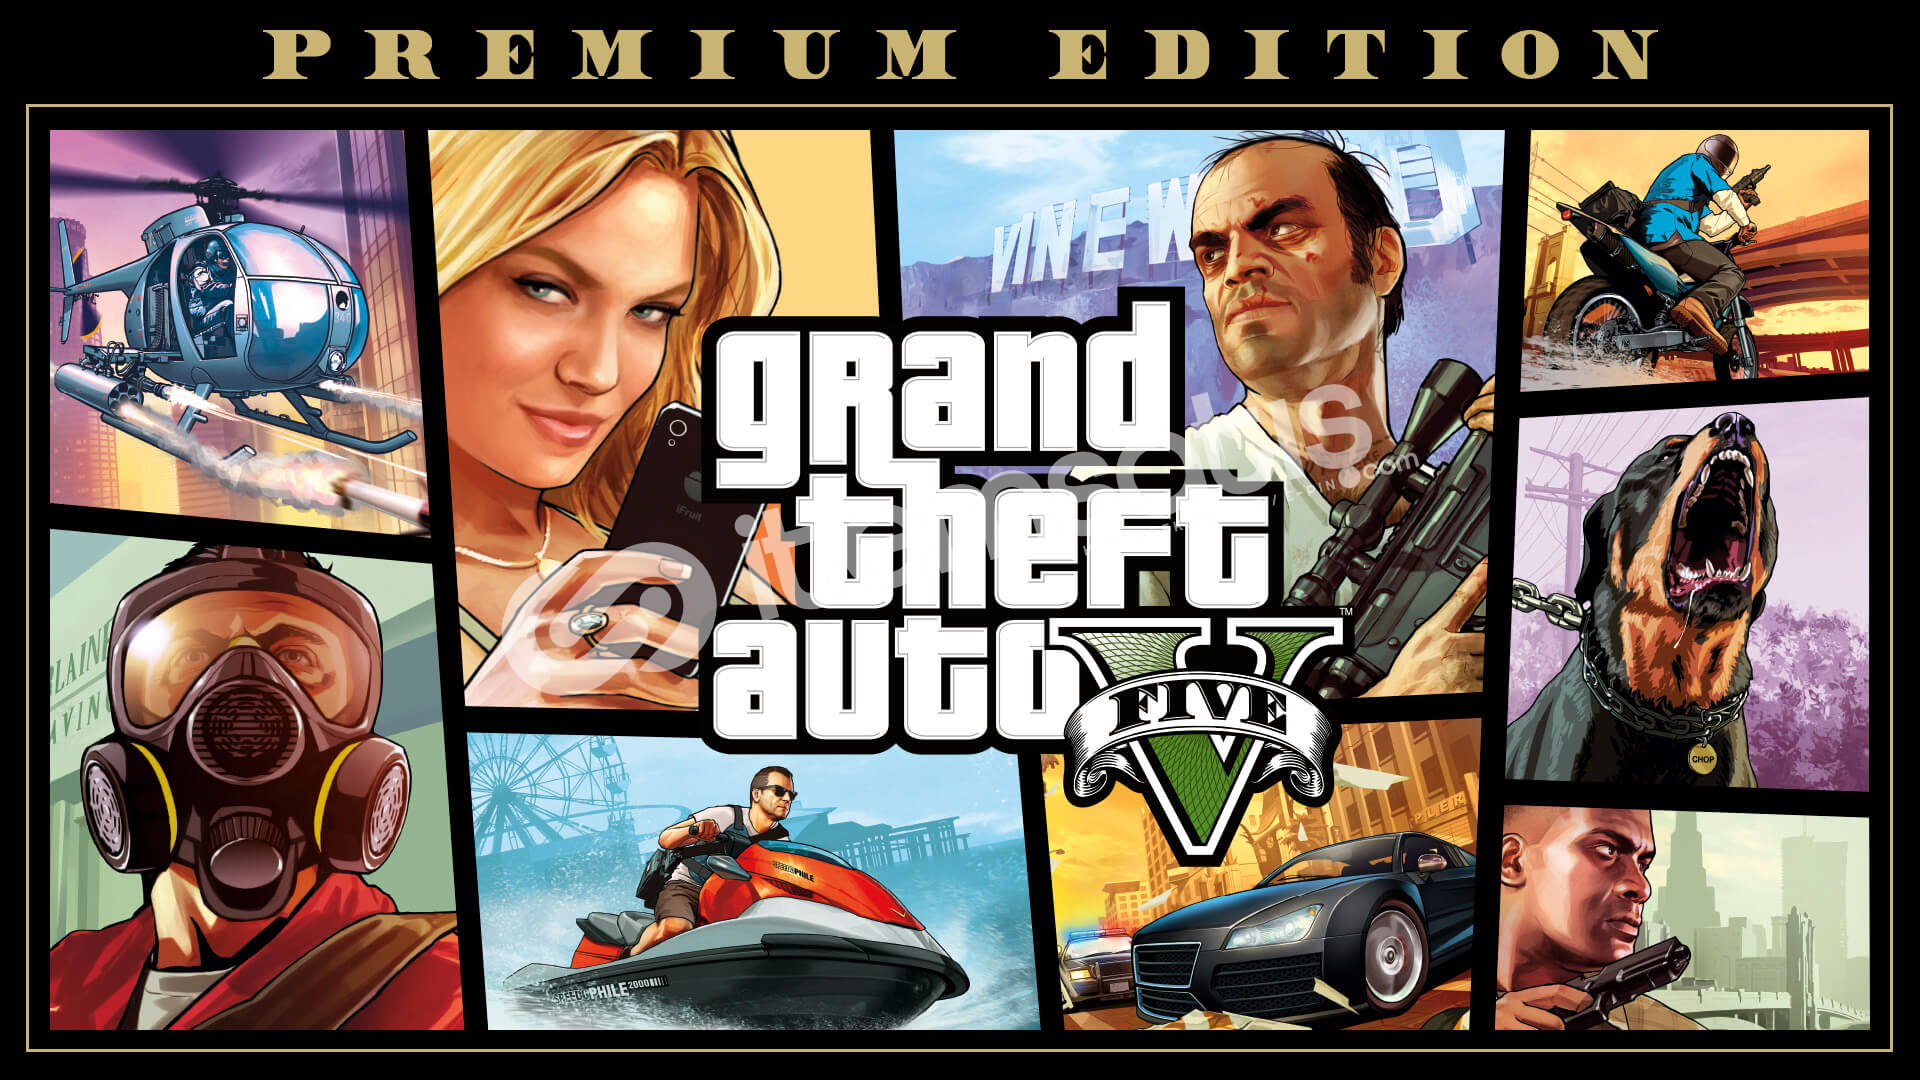 Epic Games GTA V Premium Edition